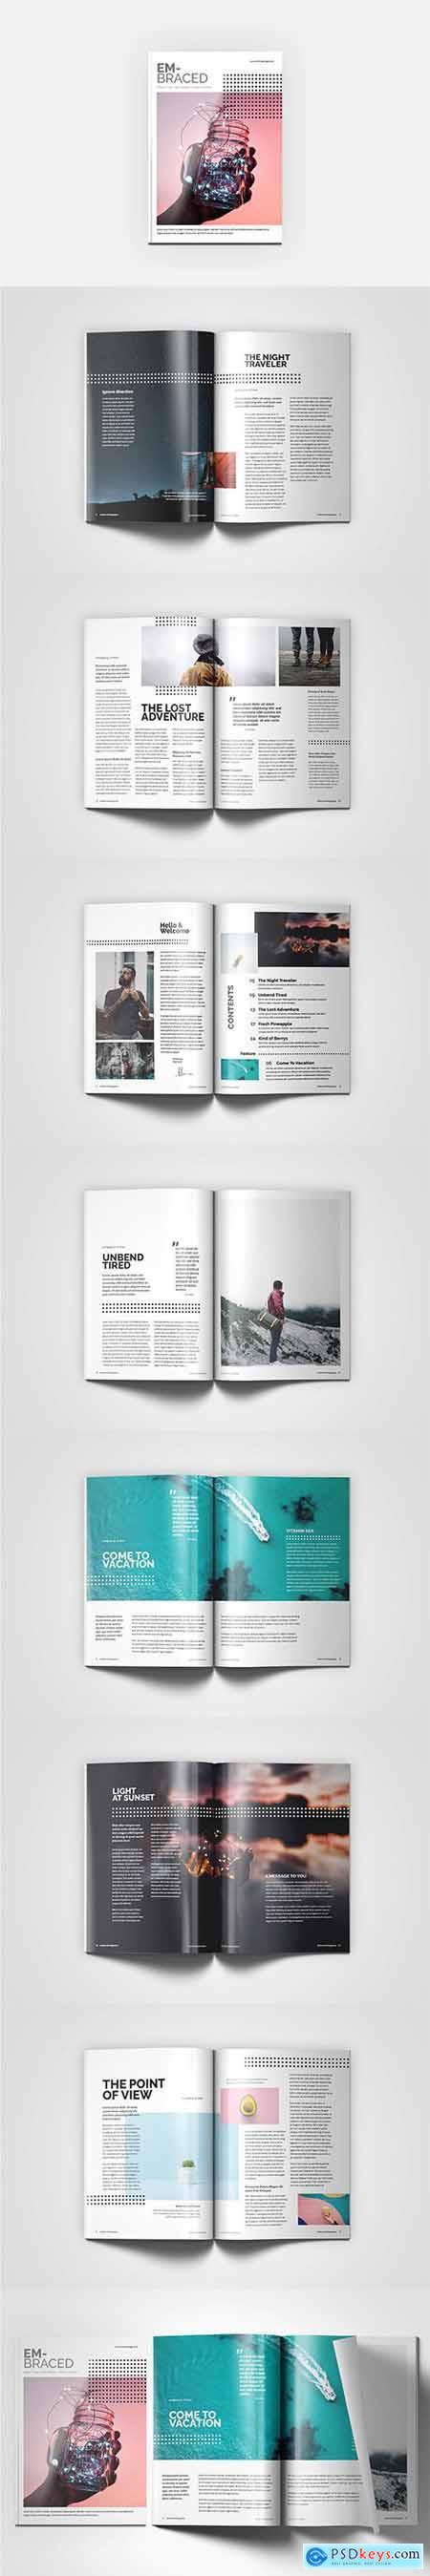 HQ - A4 Embraced Magazine V8